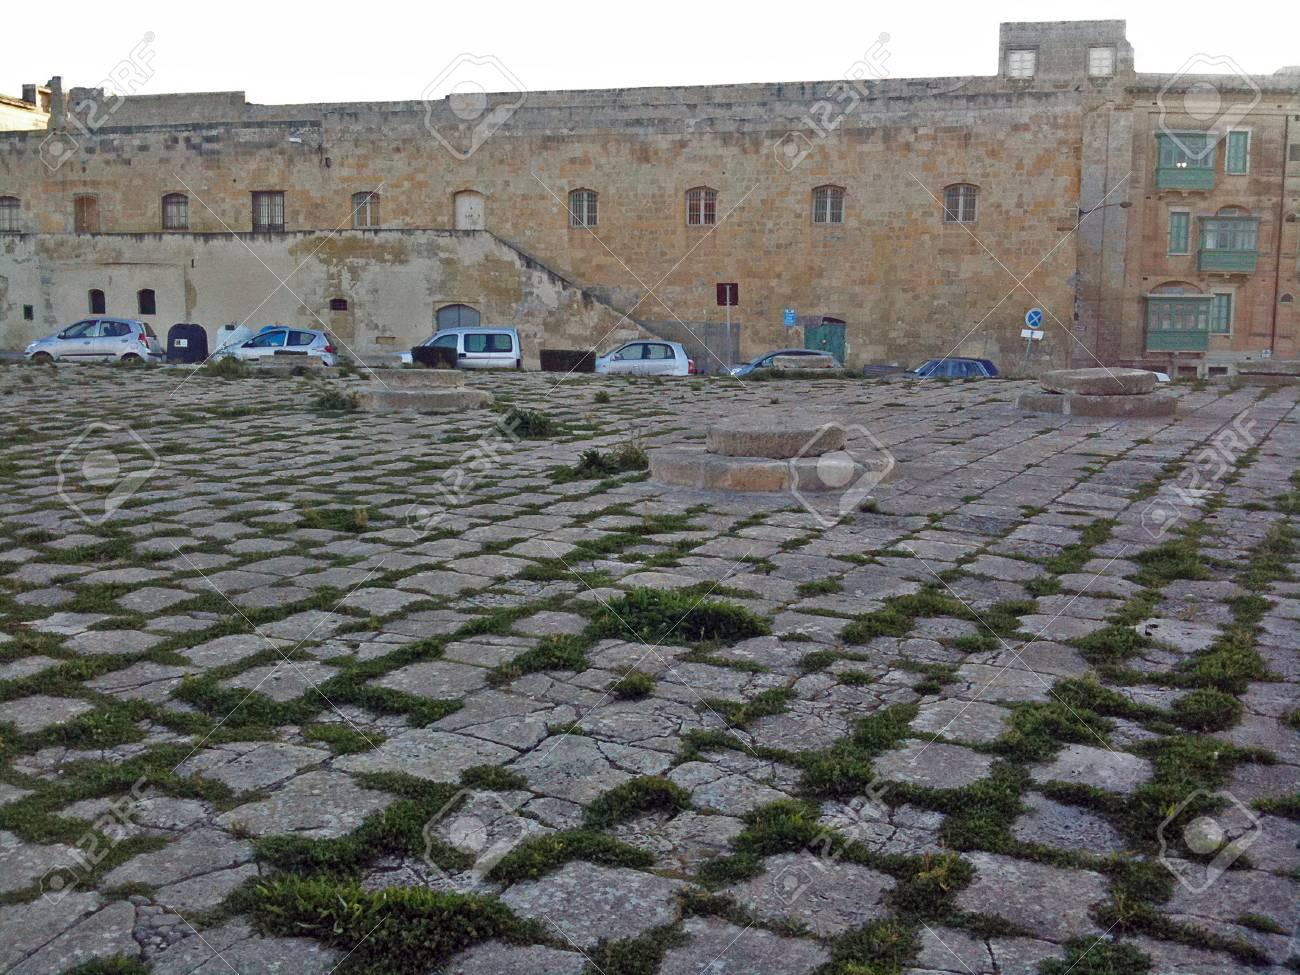 A public area clad in stonework - 34360461